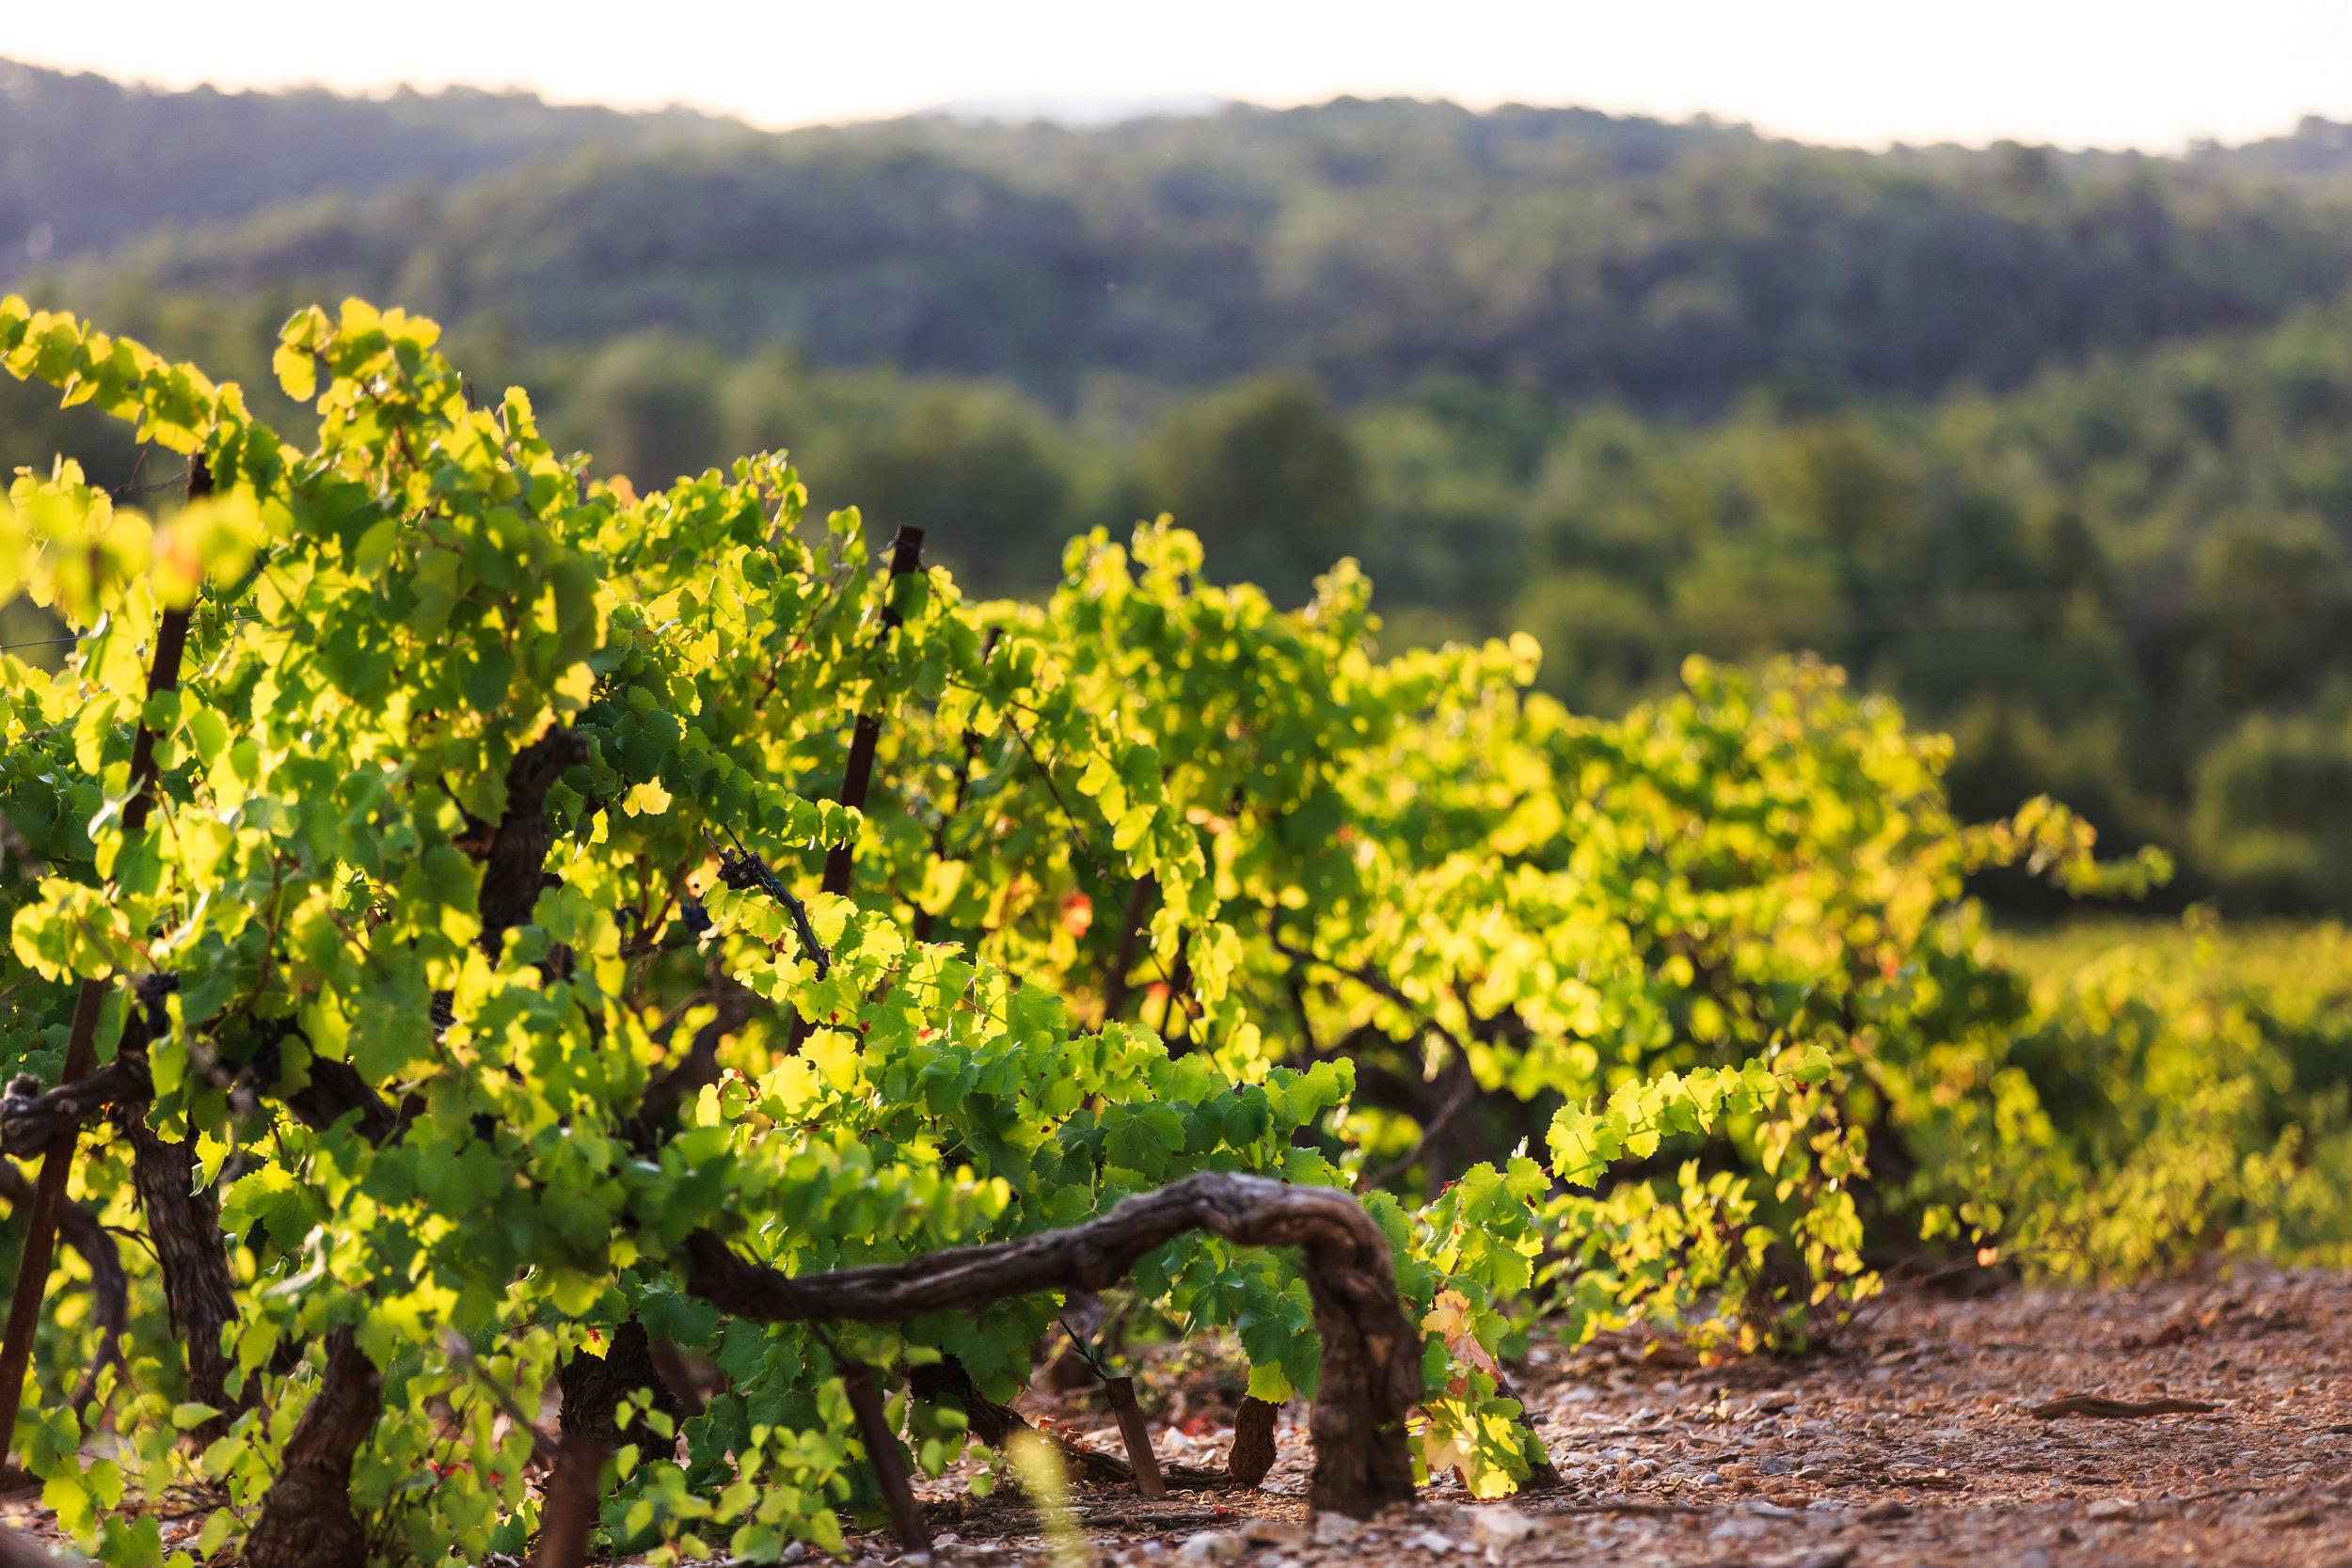 Chateau de brigue vineyard photo 2.jpg